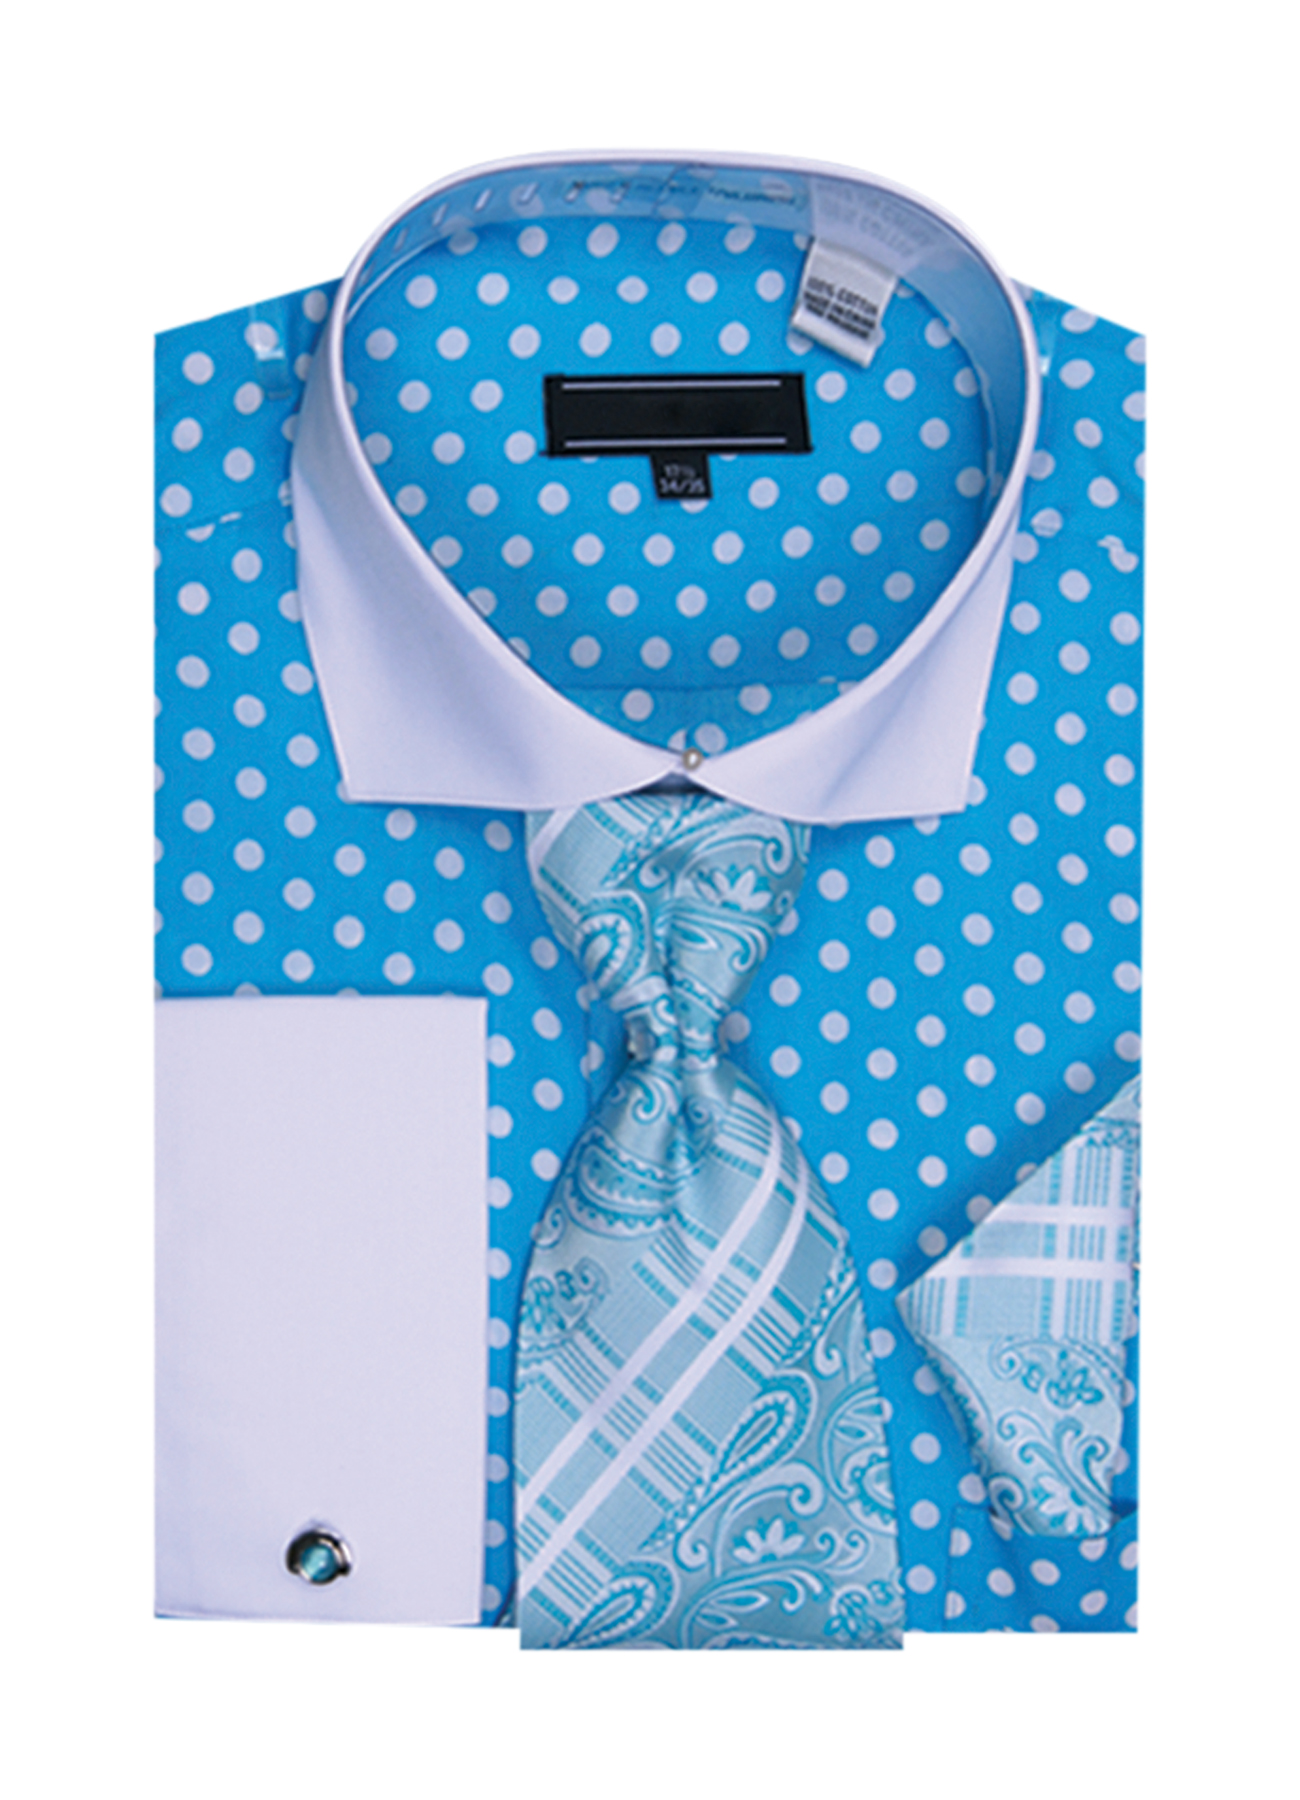 Mens Polka Dot Cutaway Collar Cotton Shirt Tie Cufflink